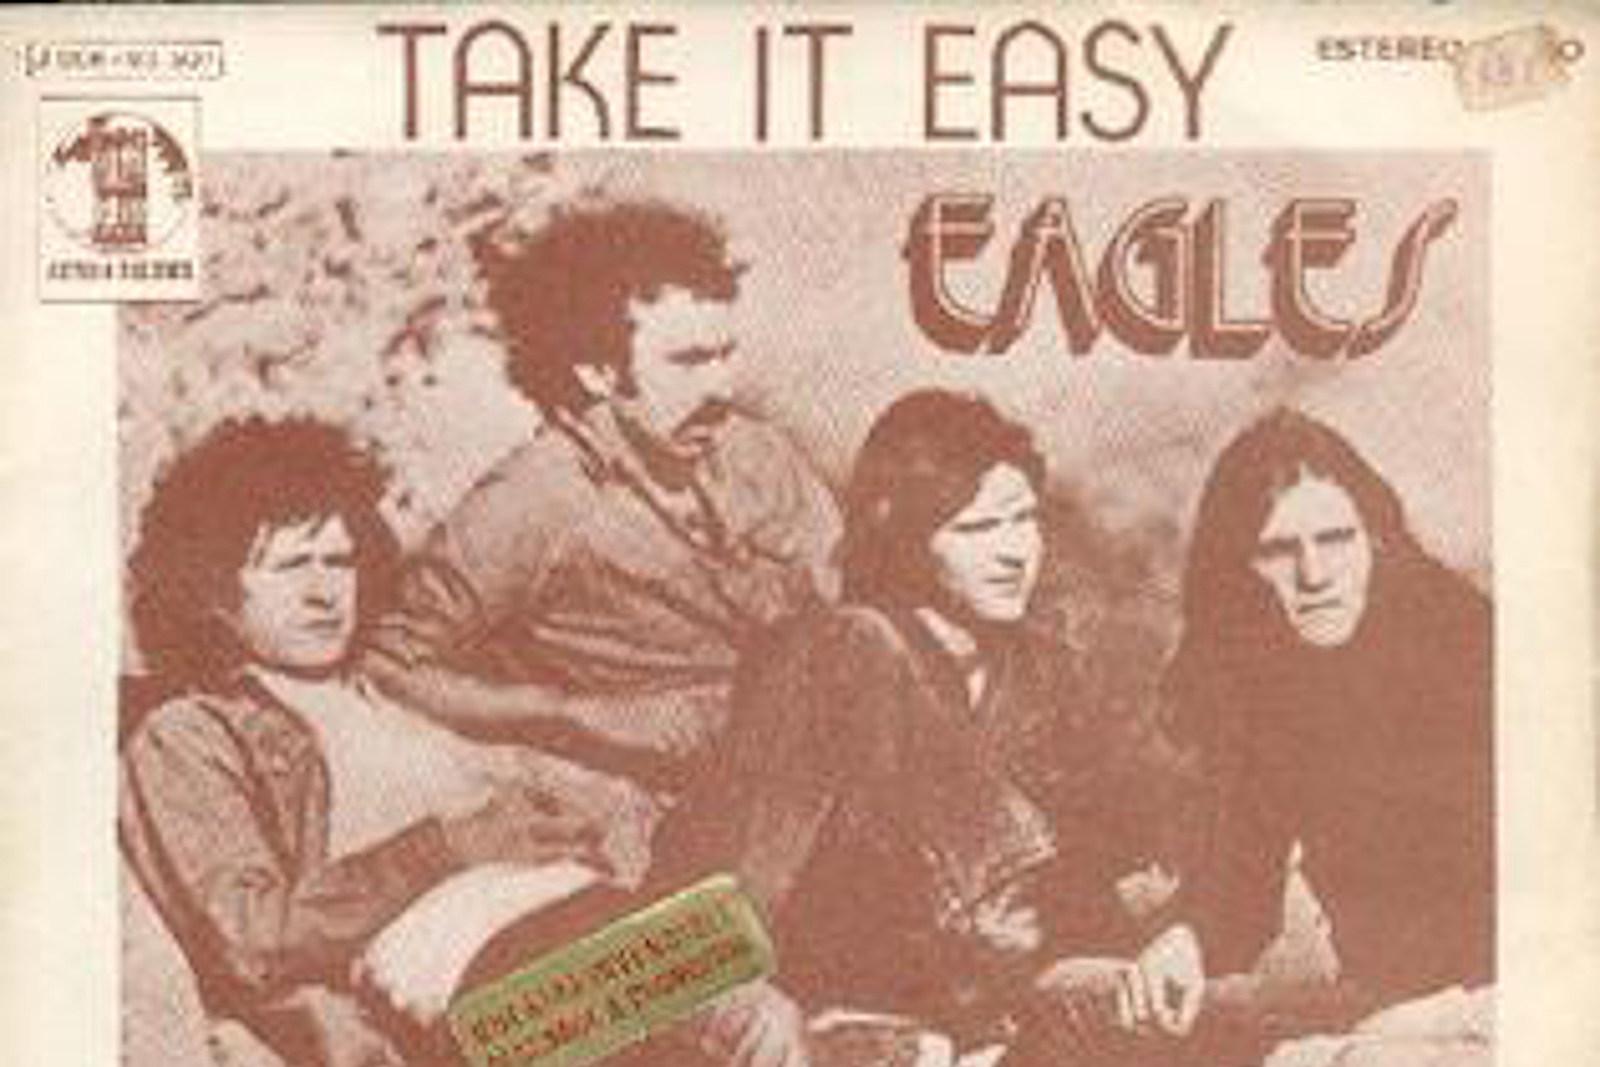 How Eagles' Glenn Frey Took Over Jackson Browne's 'Take It Easy'